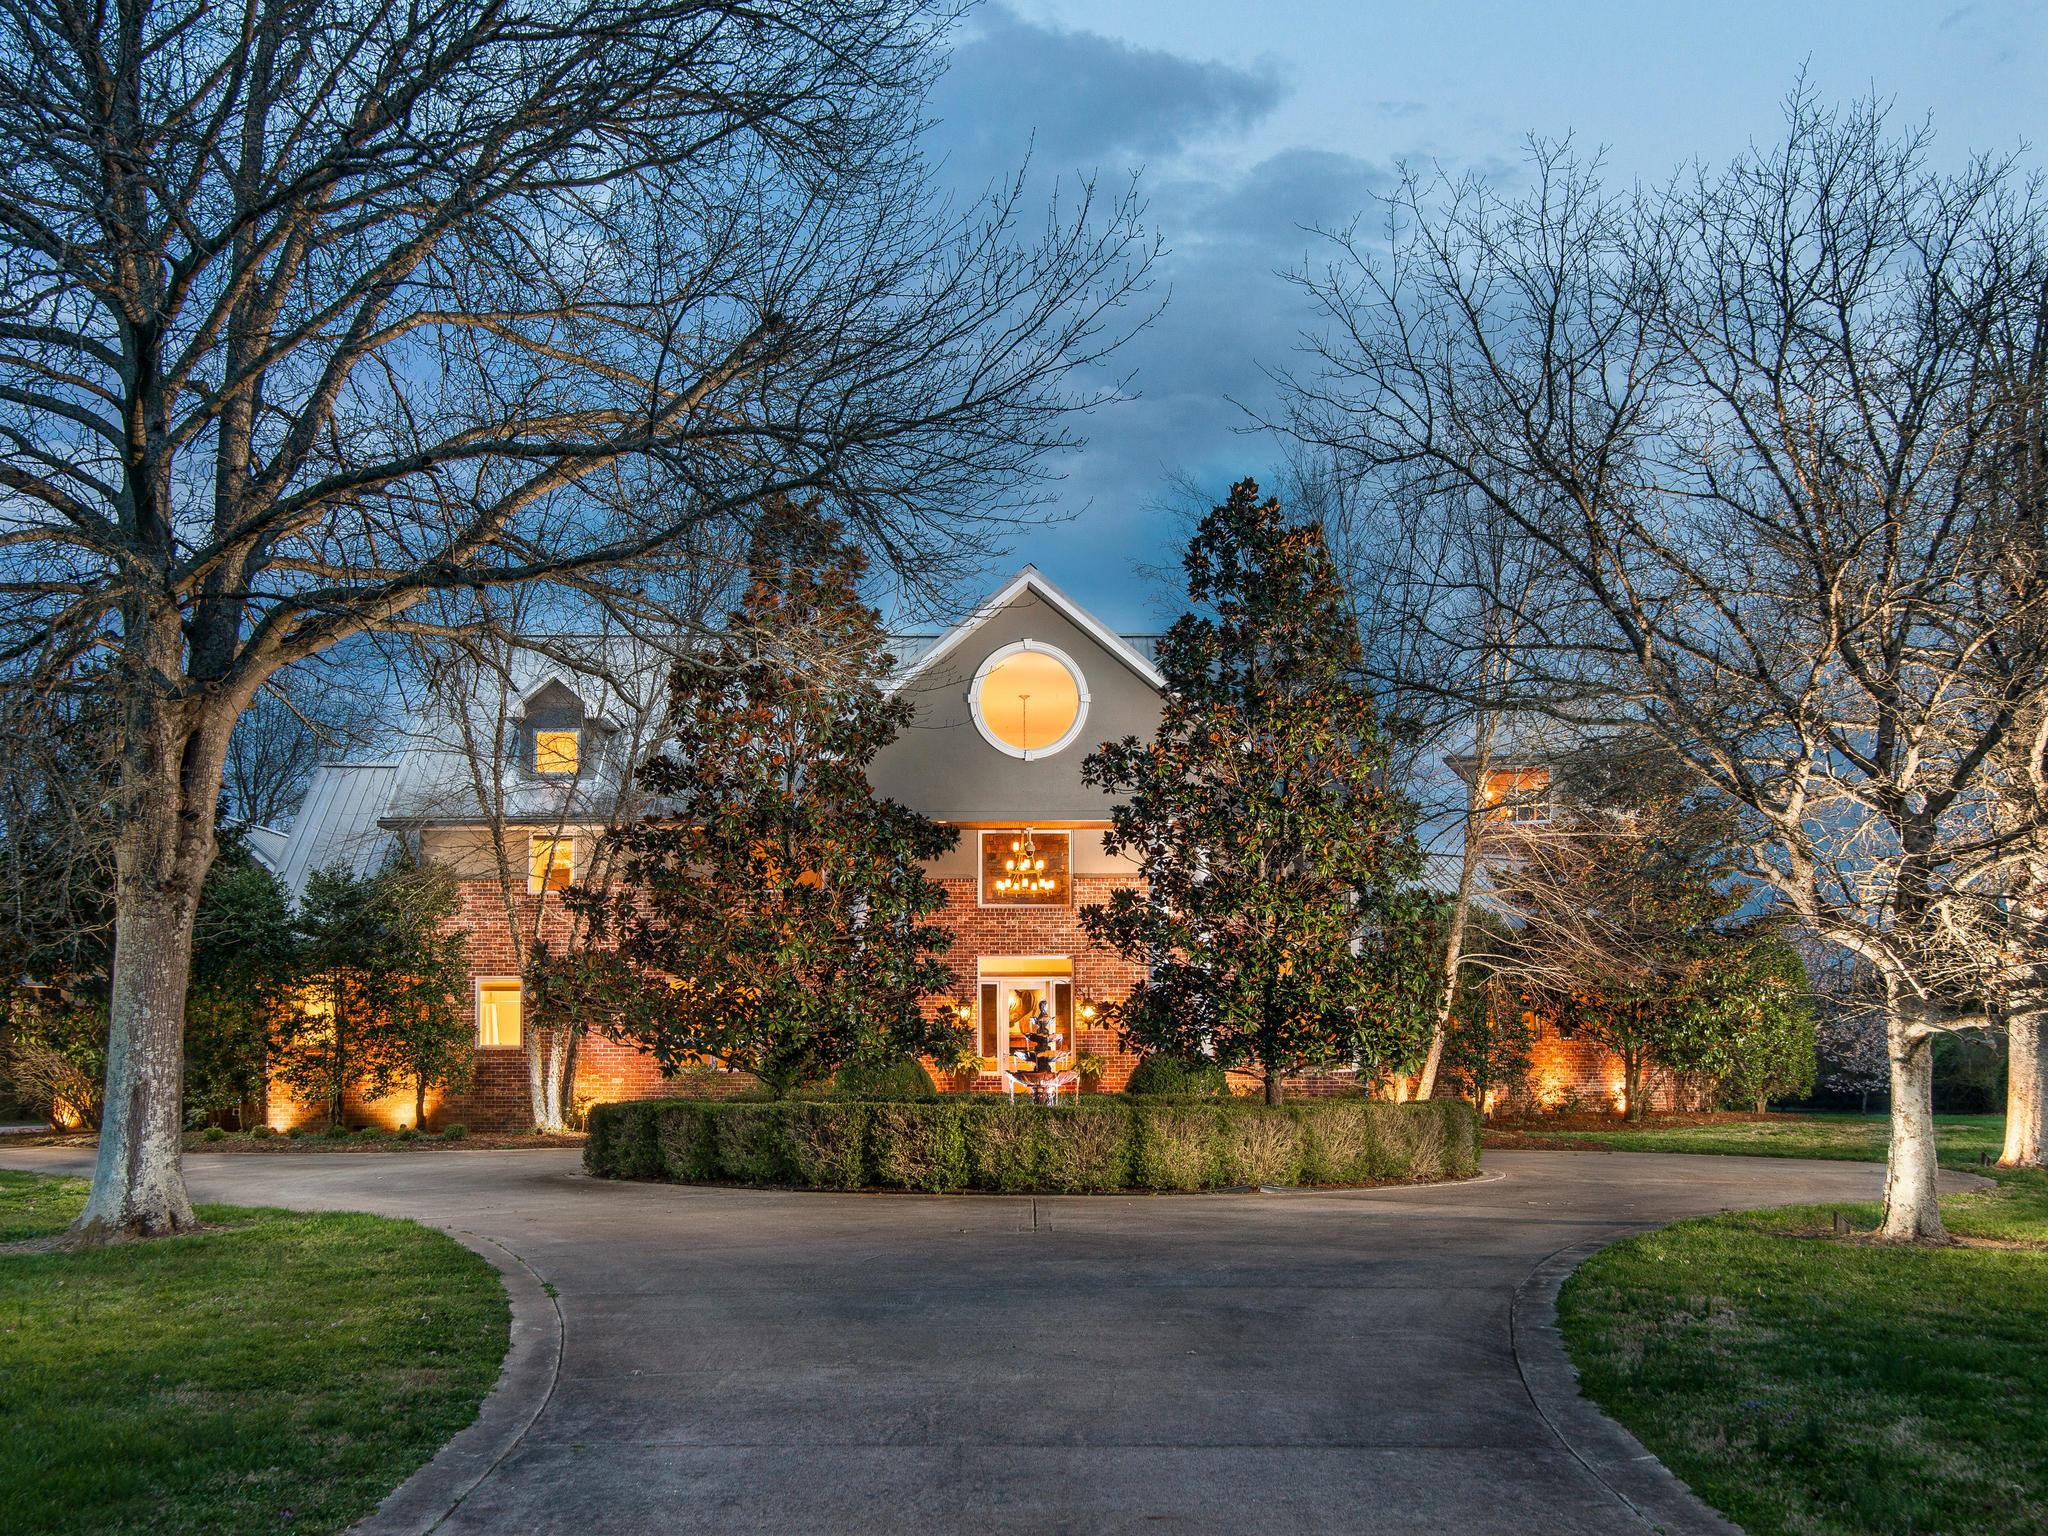 1539 Old Hillsboro Rd, Franklin, TN 37069 - Franklin, TN real estate listing